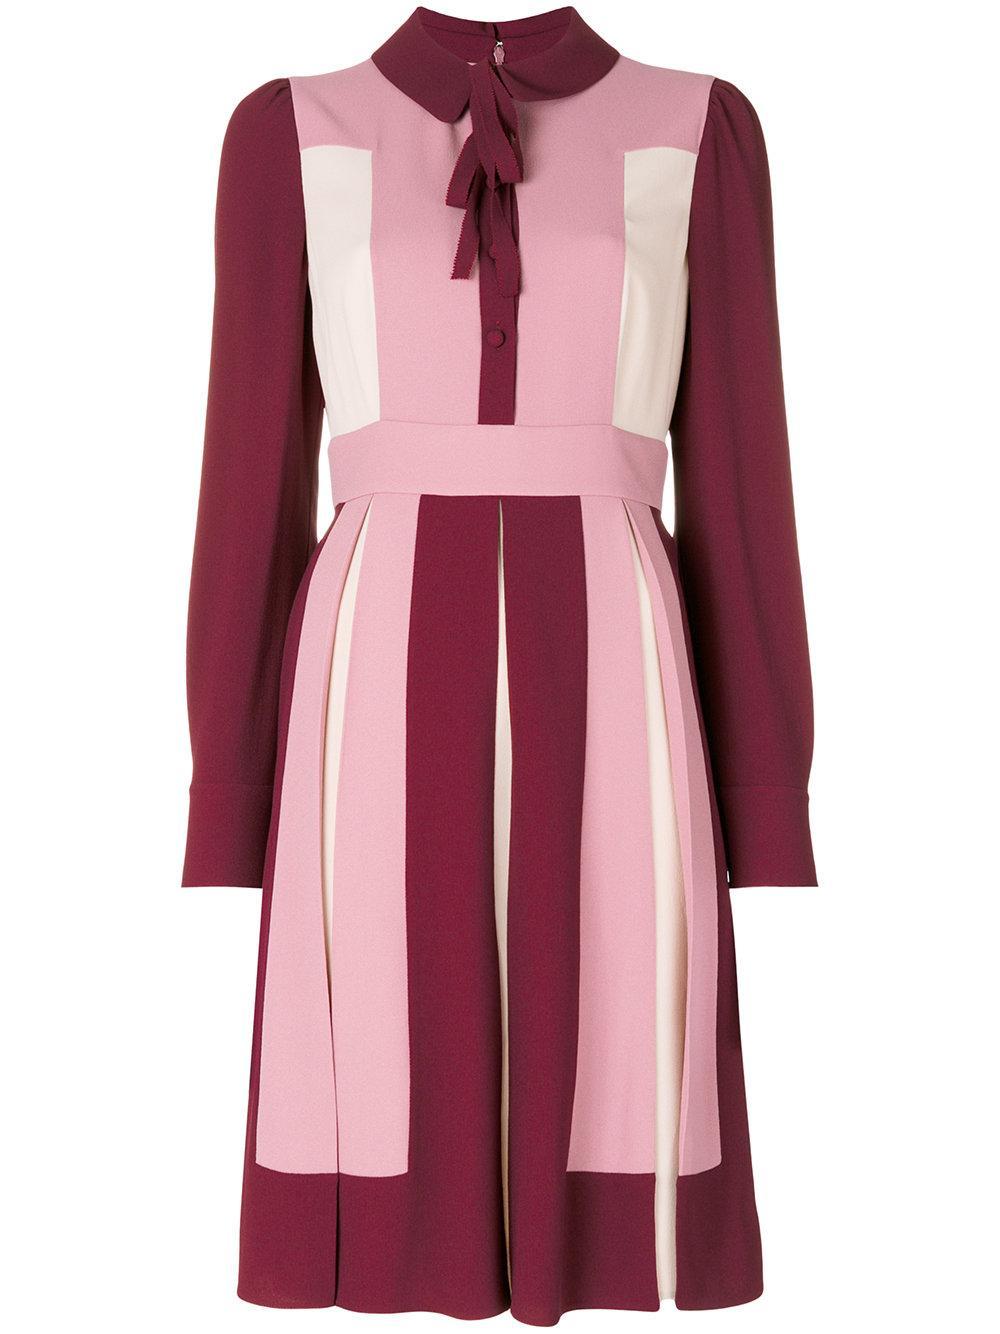 676f88742d Valentino Dresses Sale Uk